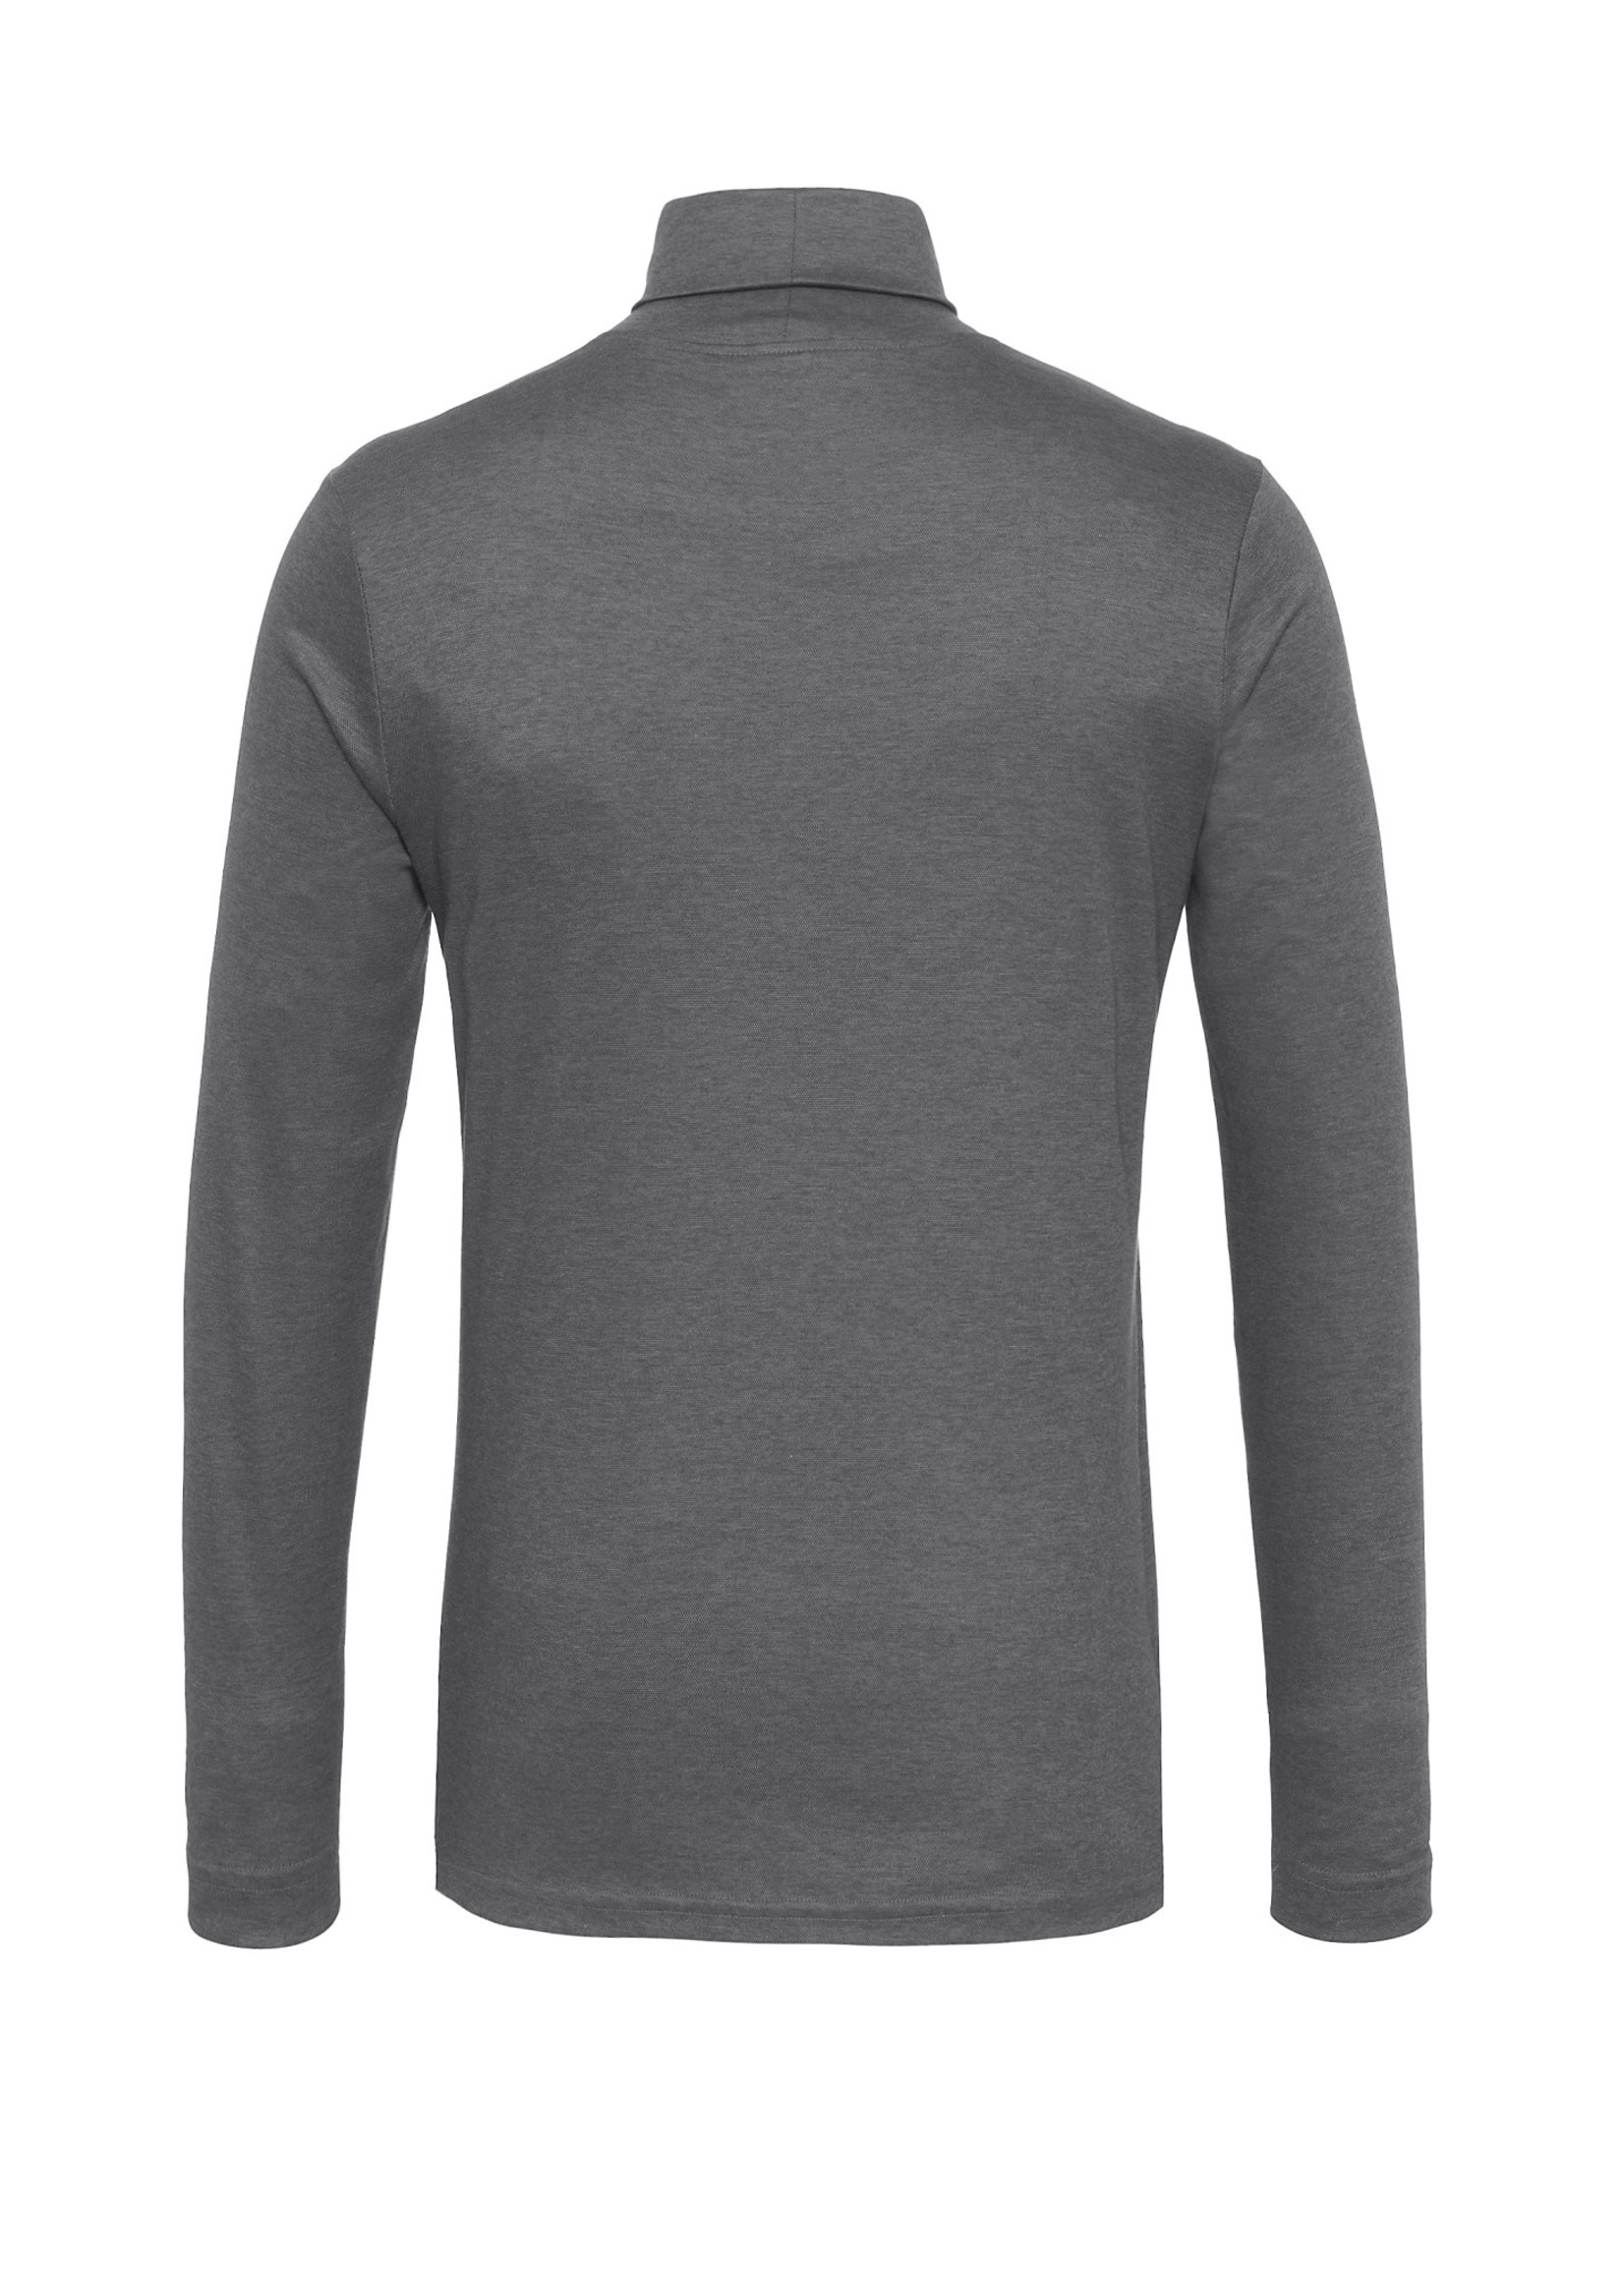 Desoto jersey coltrui grijs